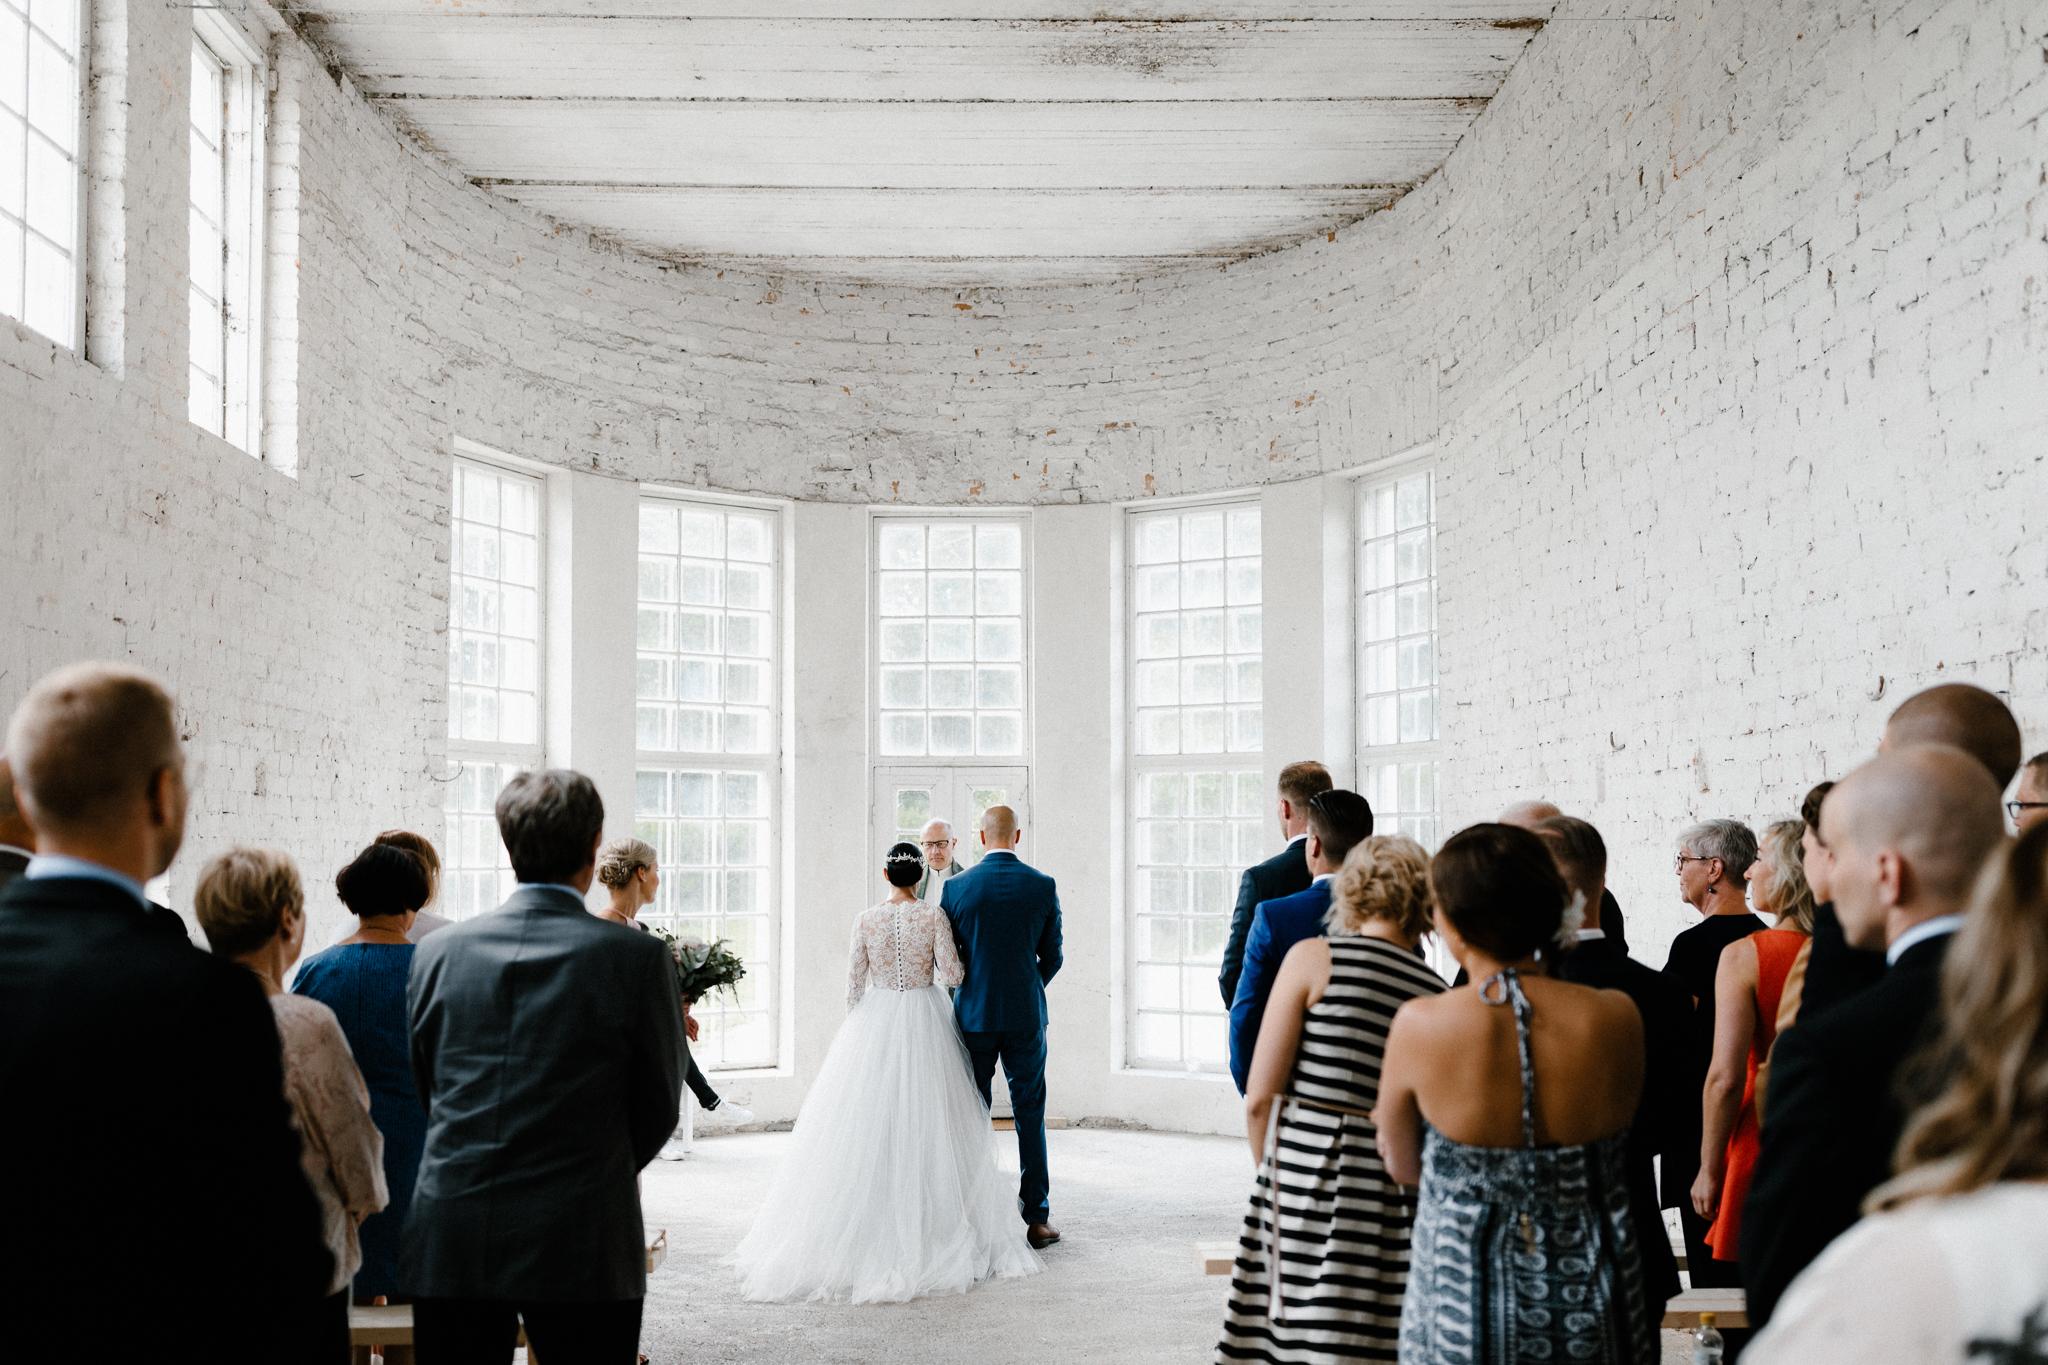 Essi + Ville   Oitbacka Gården   by Patrick Karkkolainen Wedding Photography-150.jpg